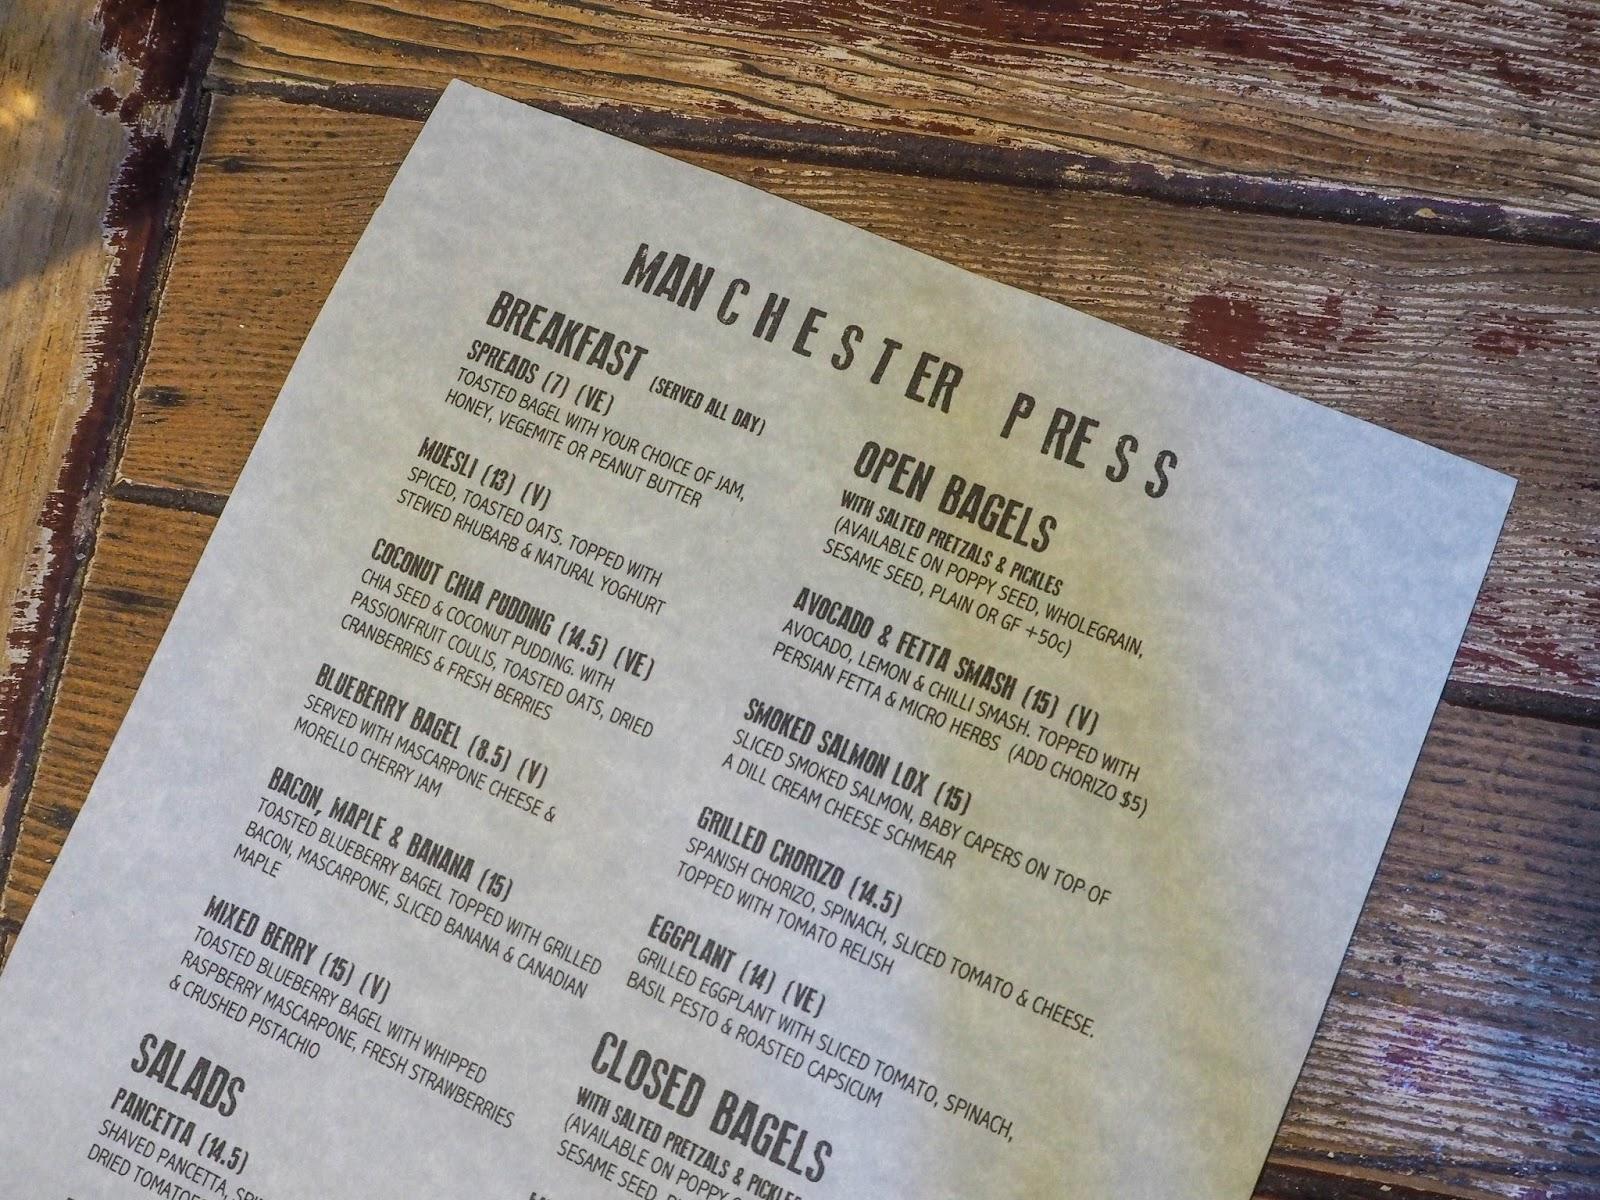 Manchester Press menu